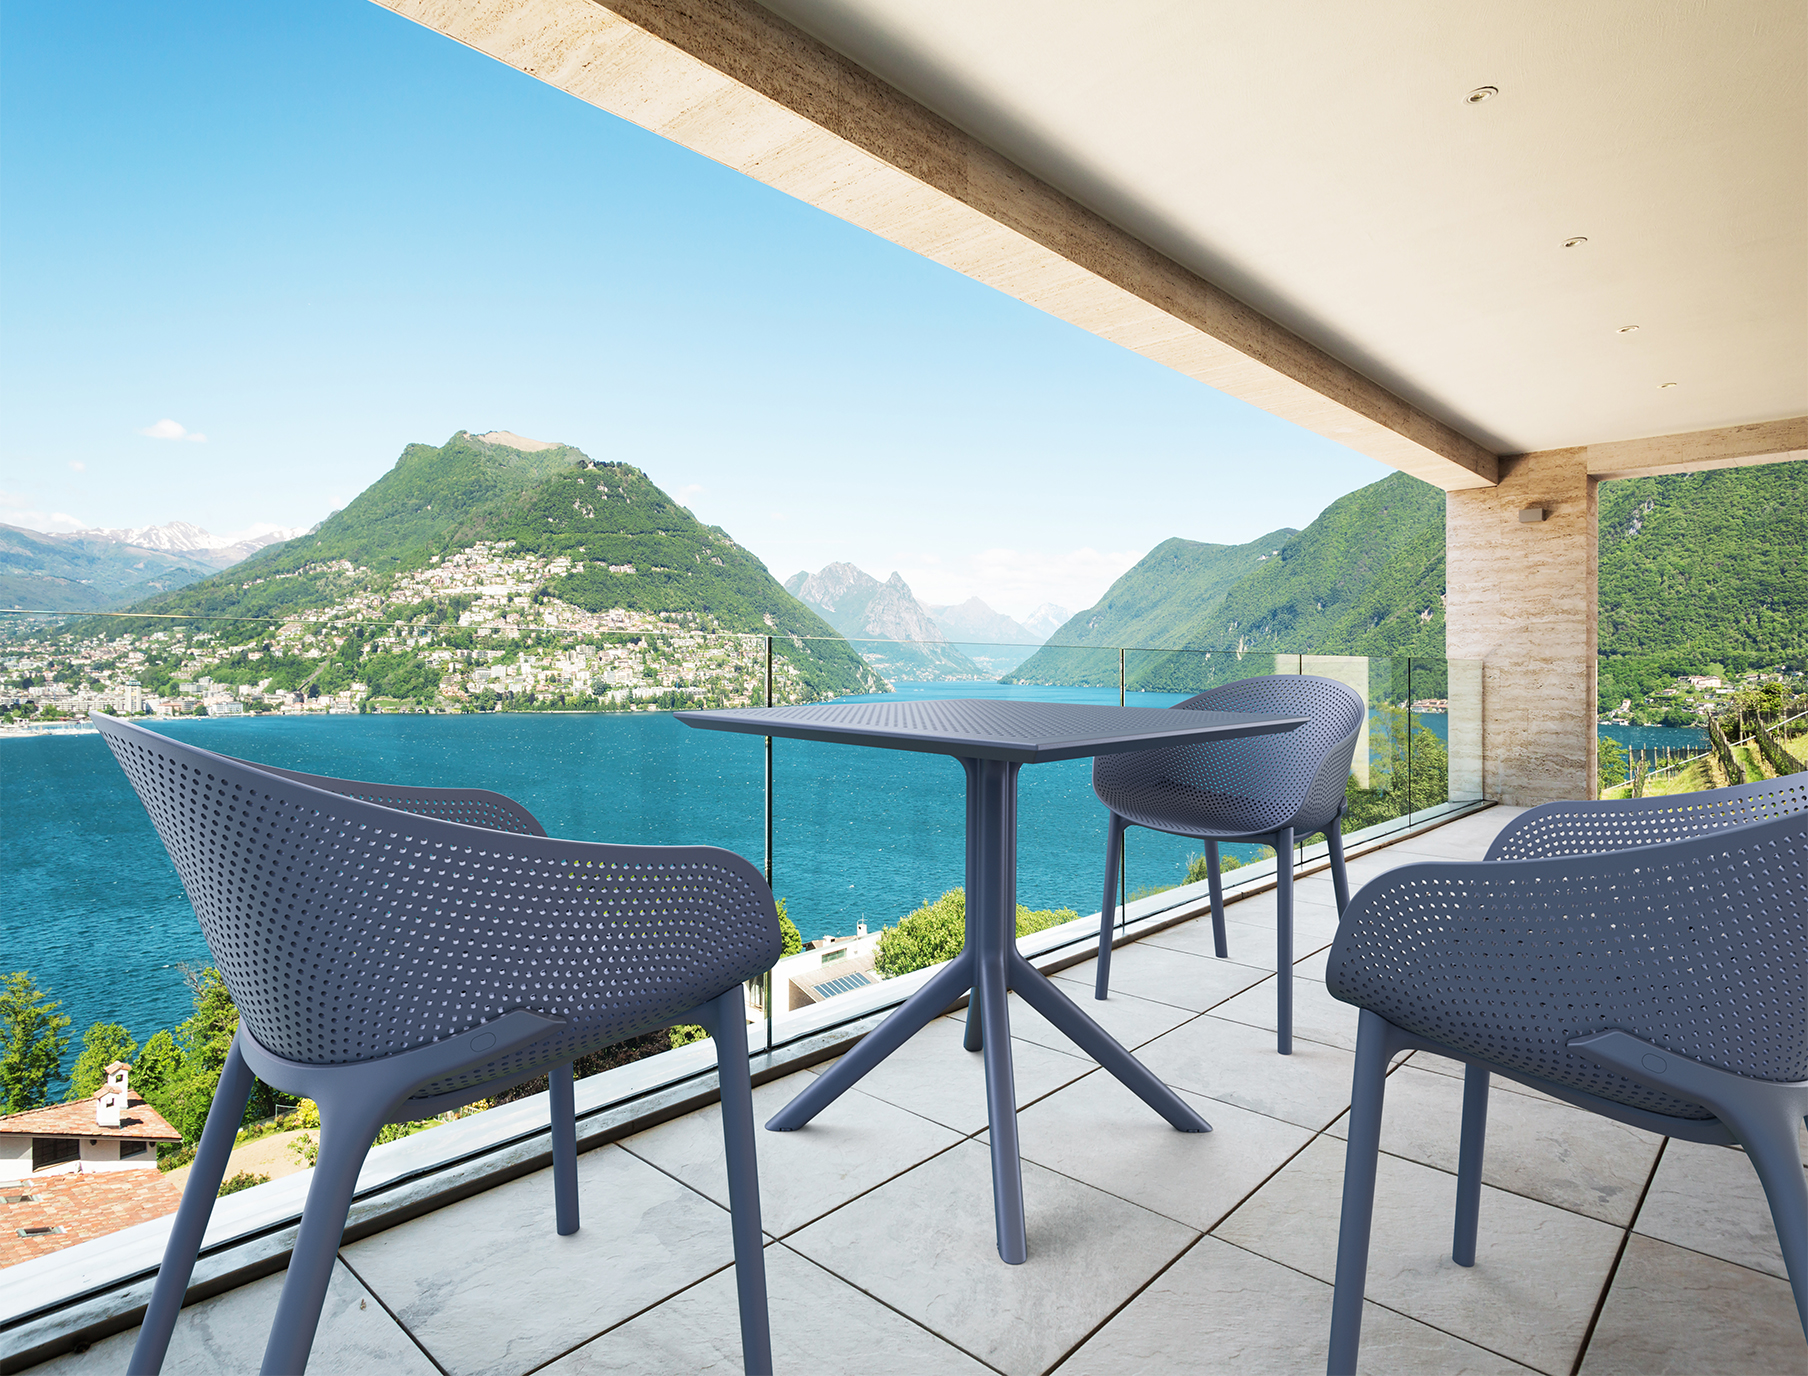 Sky Table 80 and Sky Chair Setting on Balcony